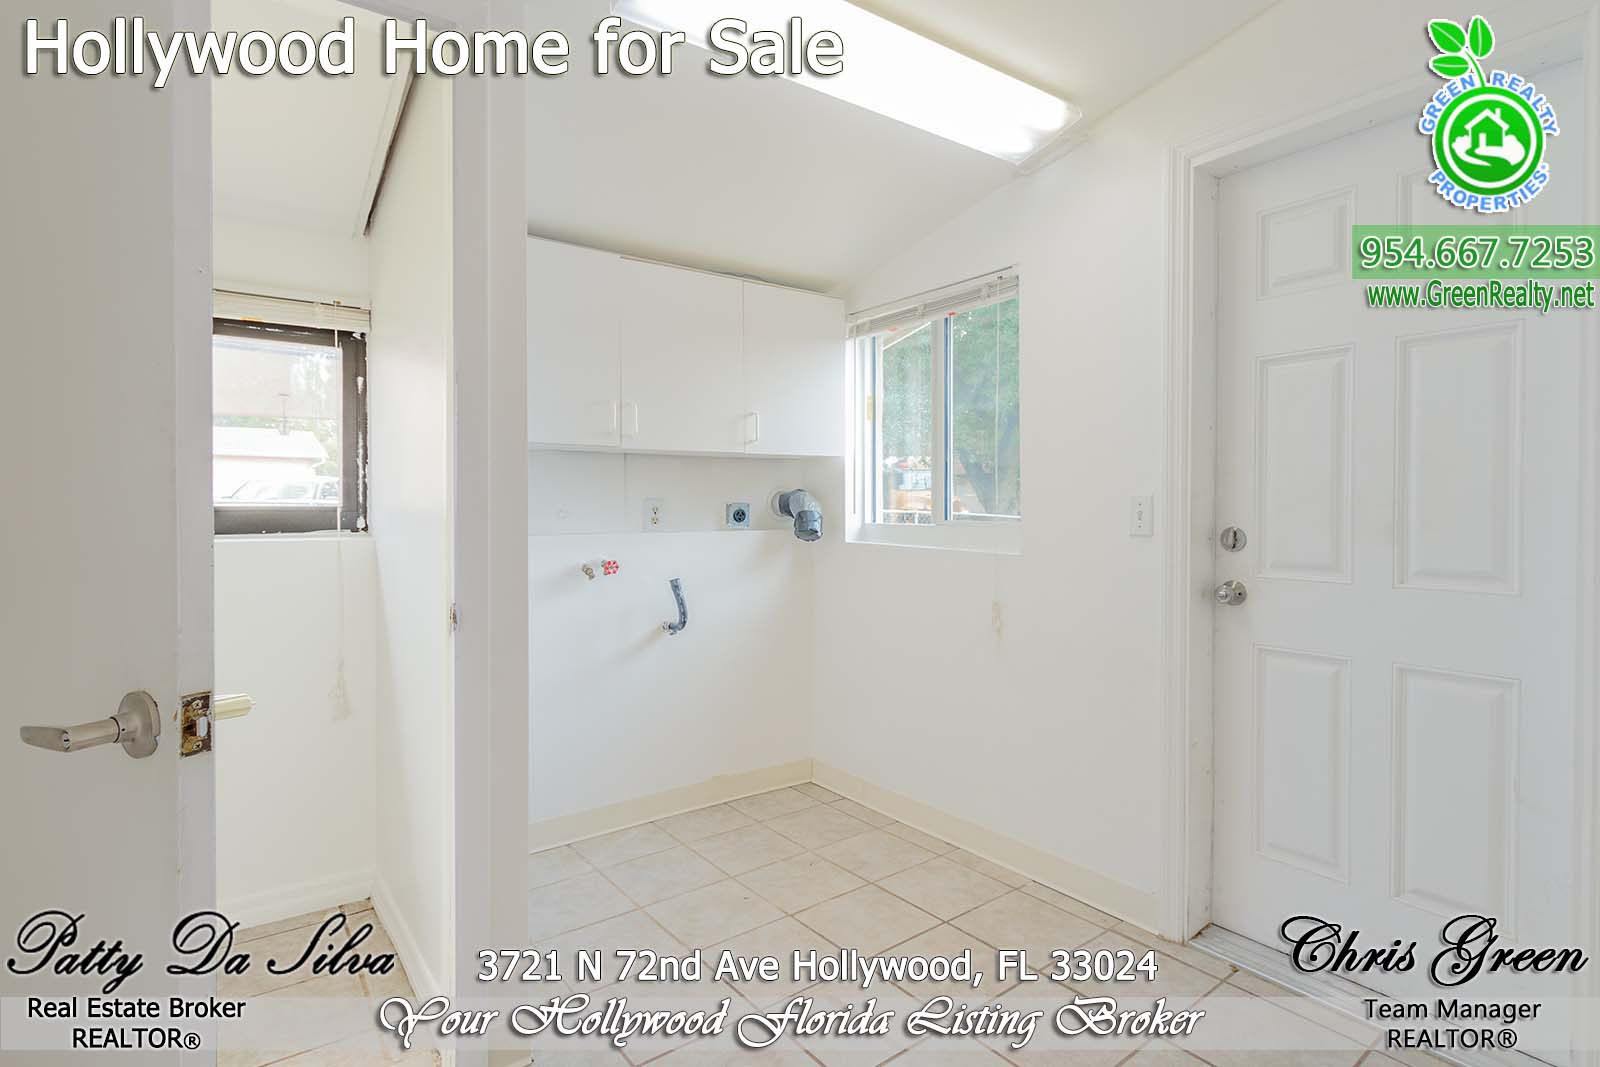 22 Hollywood Florida Real Estate Listing Patty Da Silva Green Realty properties (20)